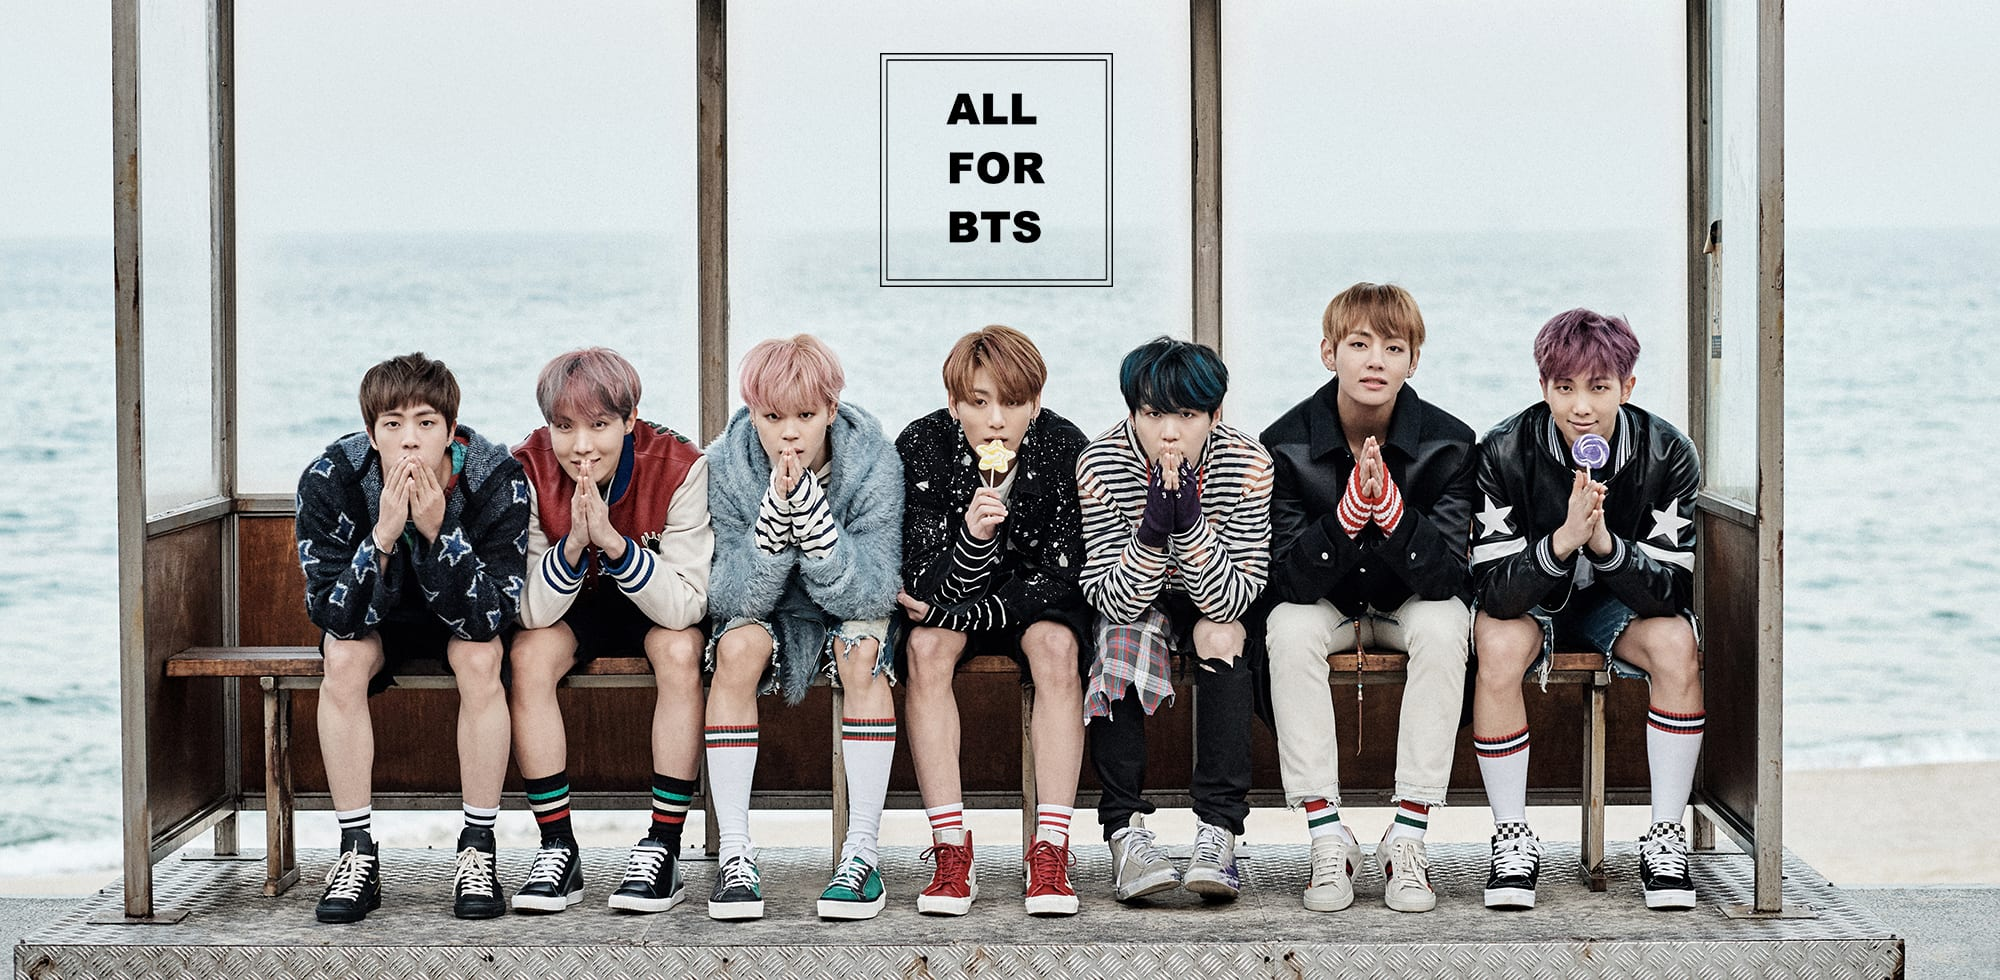 BTS Reaches 5 Million Followers On V LIVE App